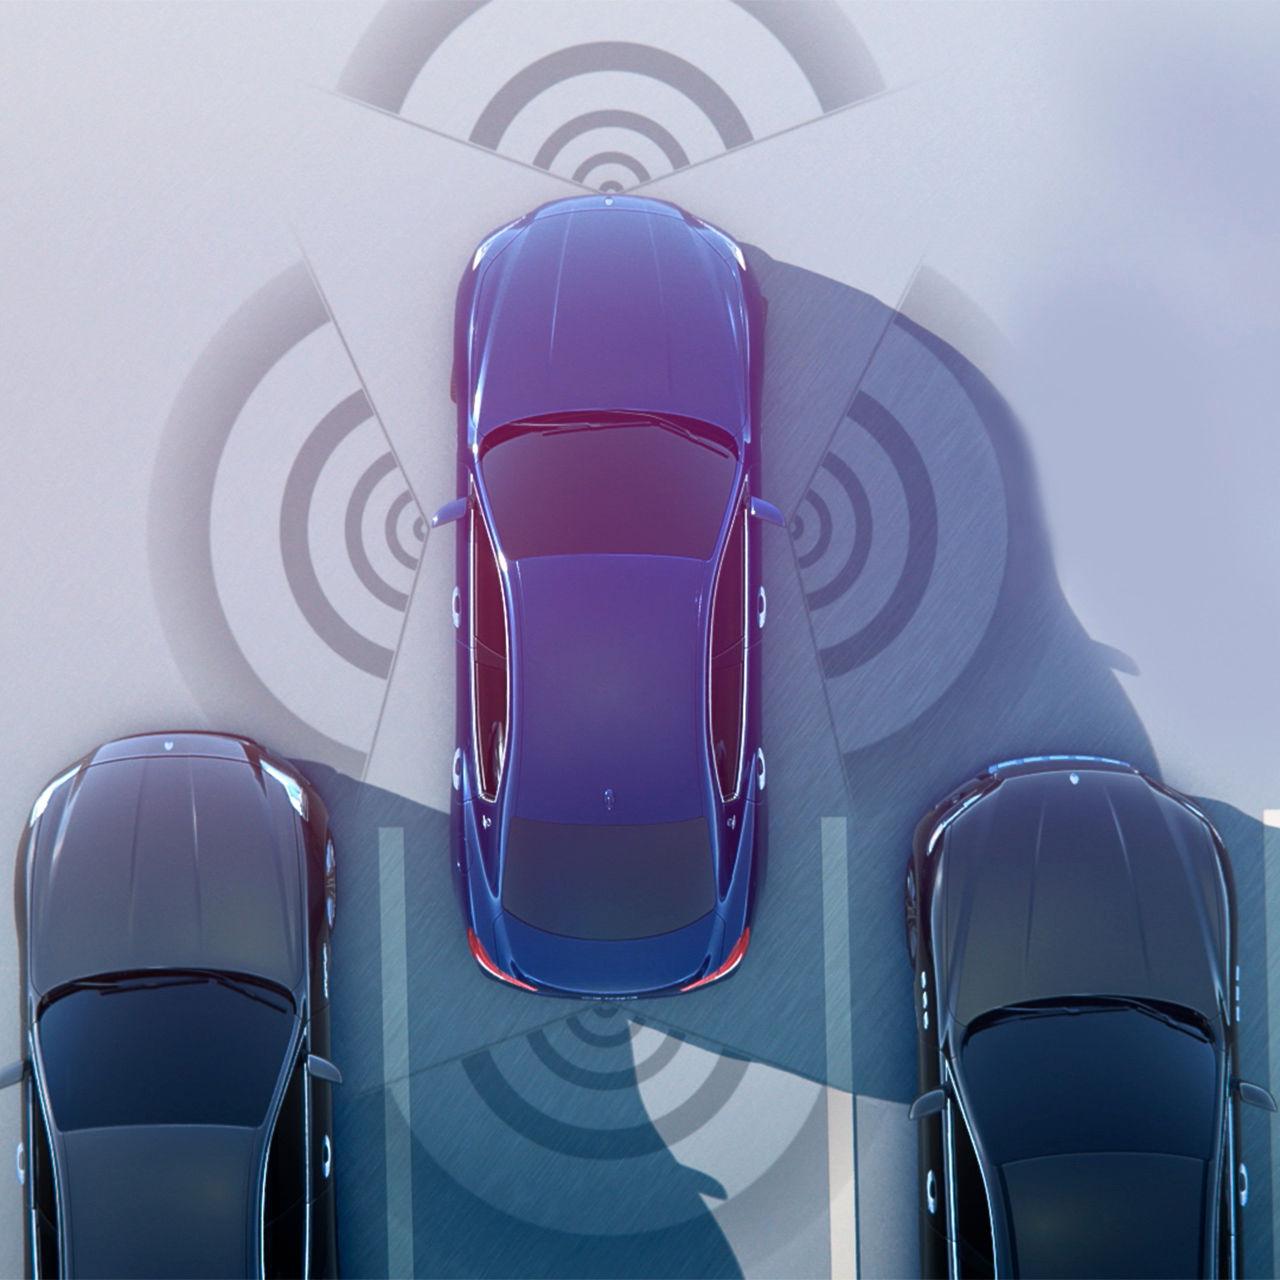 Maserati Surround View Camera